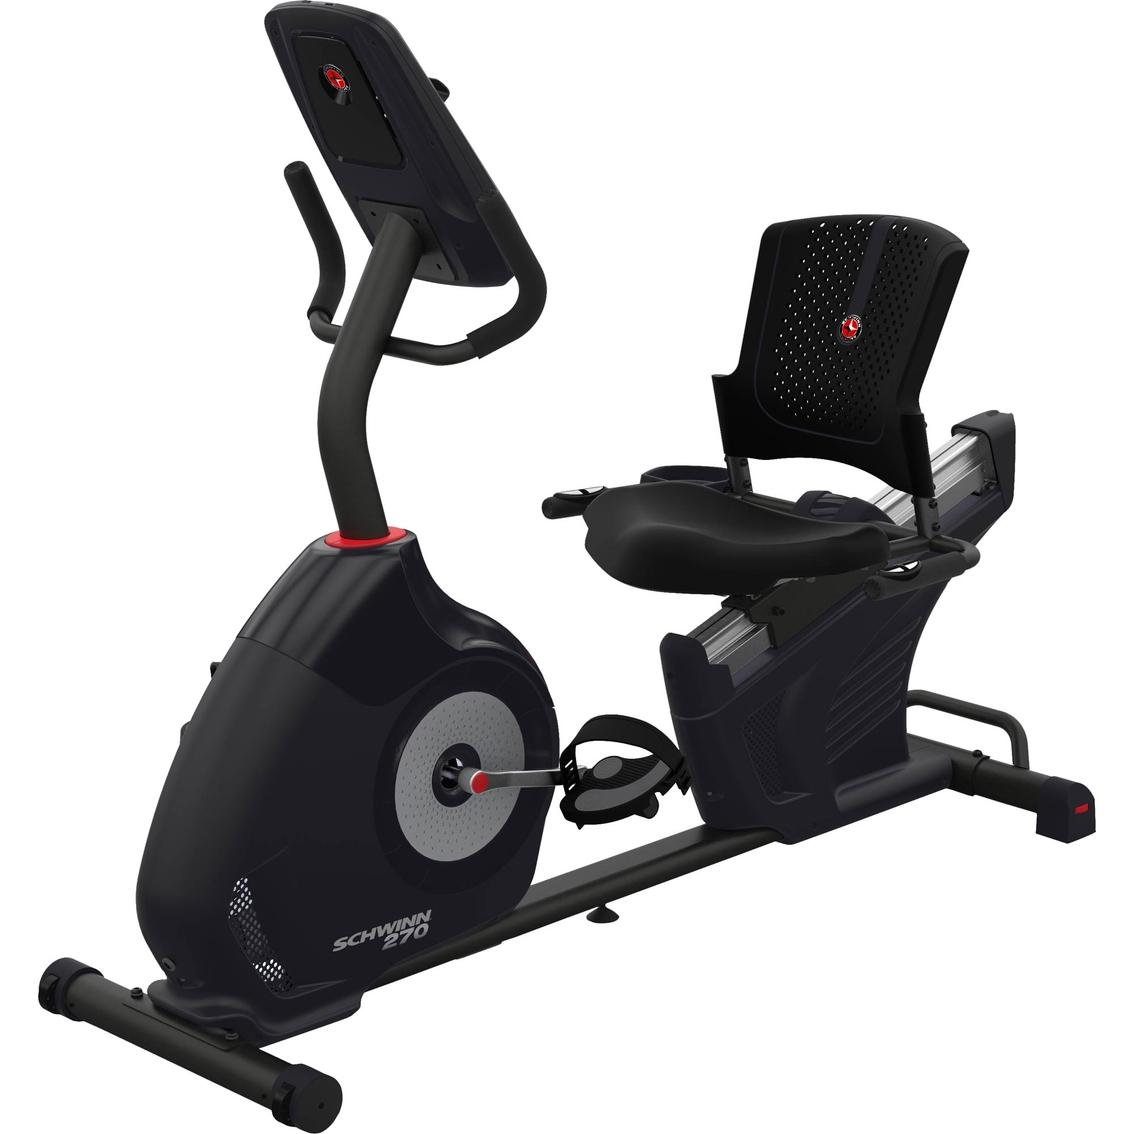 025efbce721 Schwinn 270 Recumbent Bike | Cardio Equipment | Sports & Outdoors ...